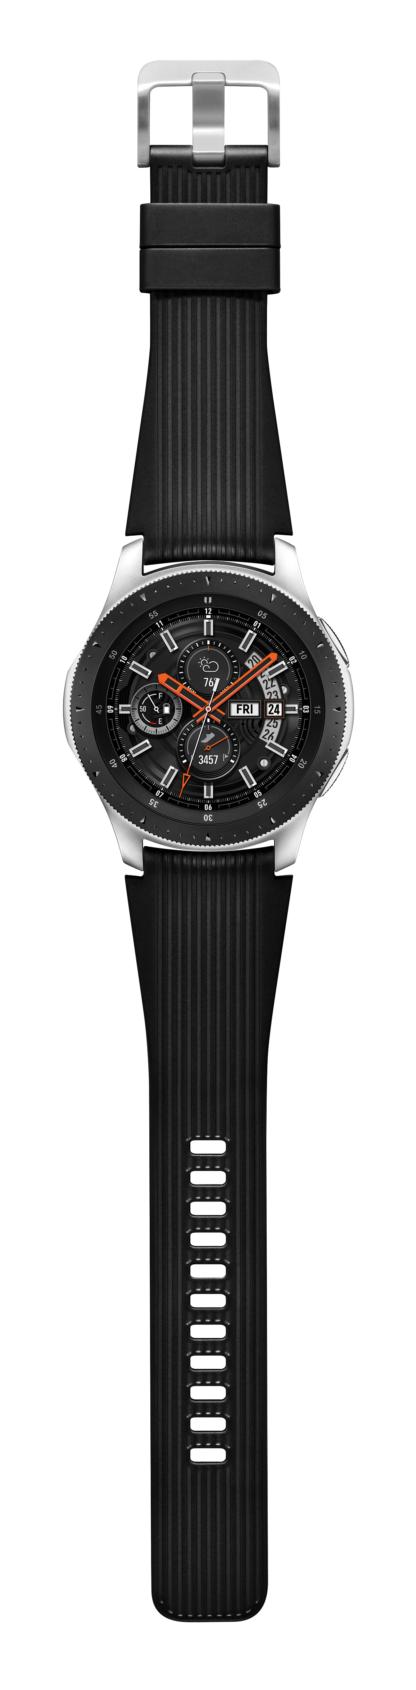 Samsung Galaxy Watch Open Front